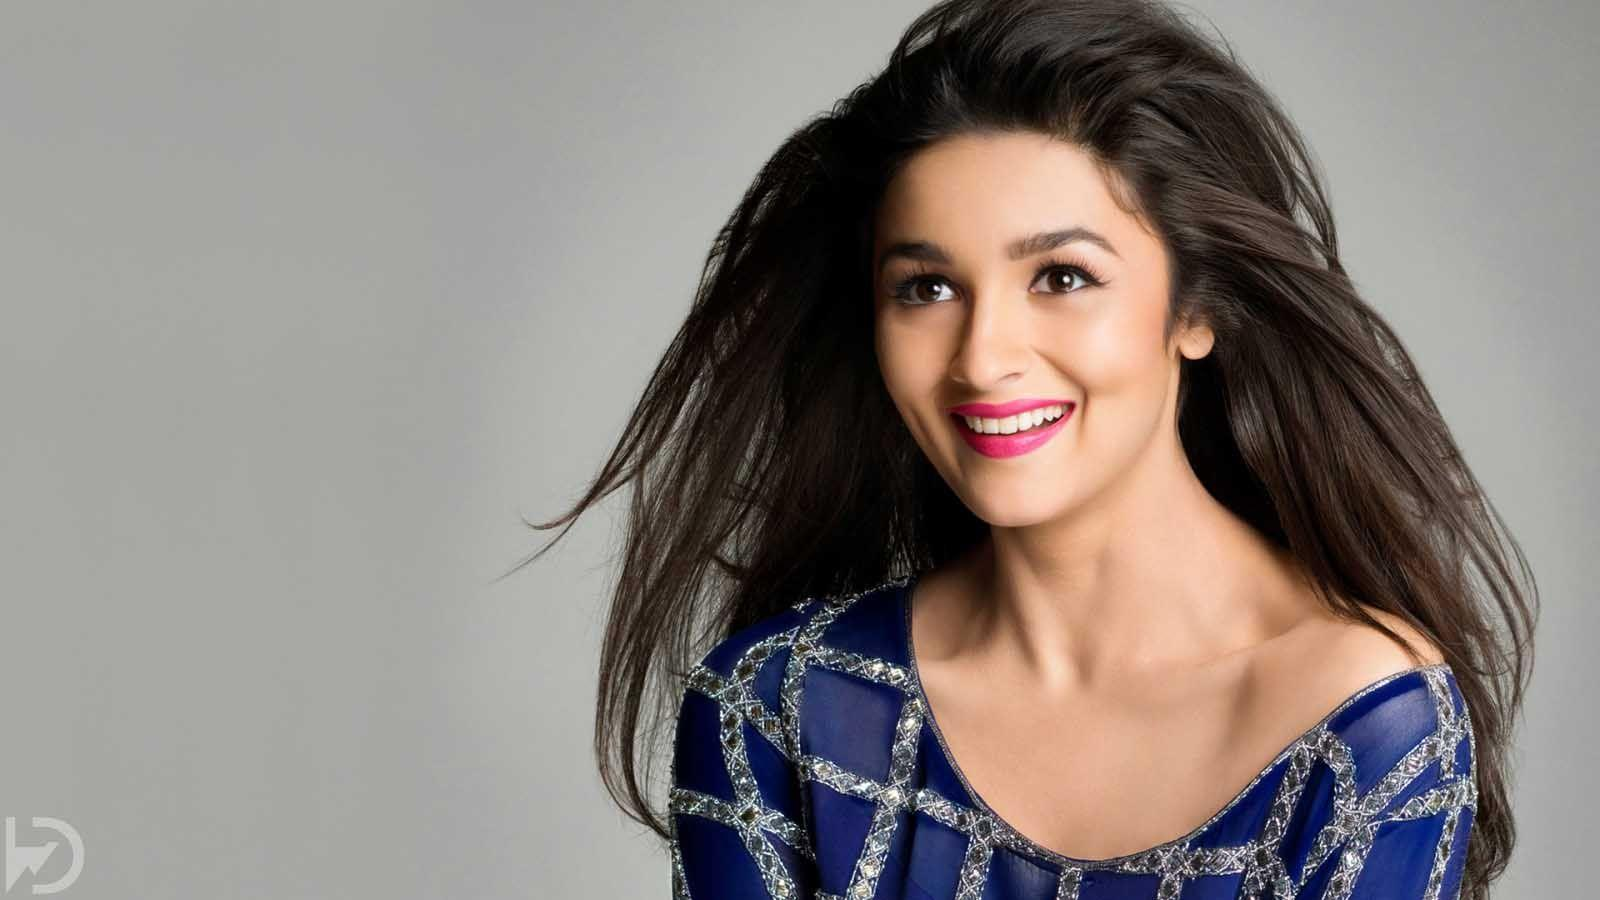 Bollywood Actress Full Hd Wallpapers Wallpaper Cave